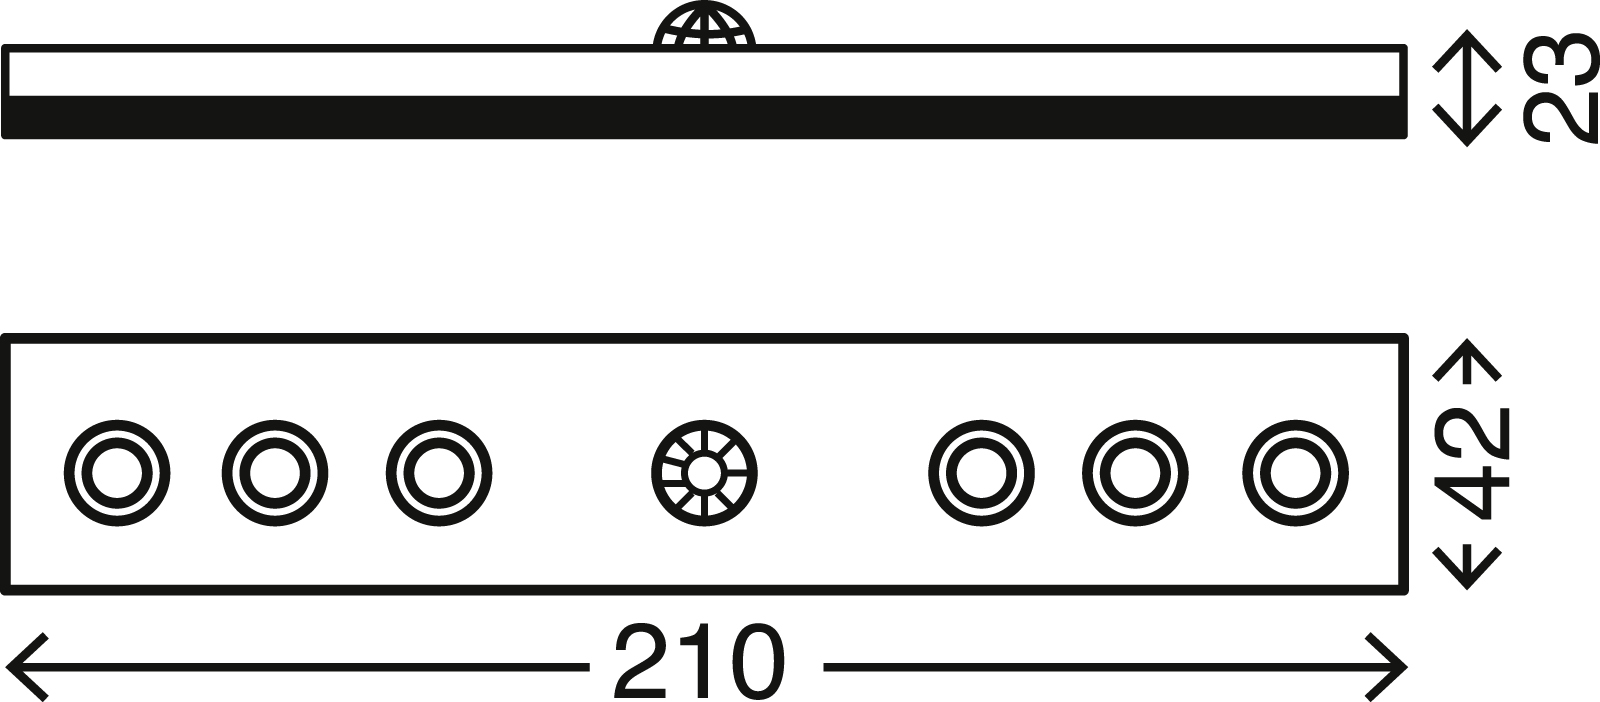 LED Unterbauleuchte, 21 cm, 0,48 W, Titan